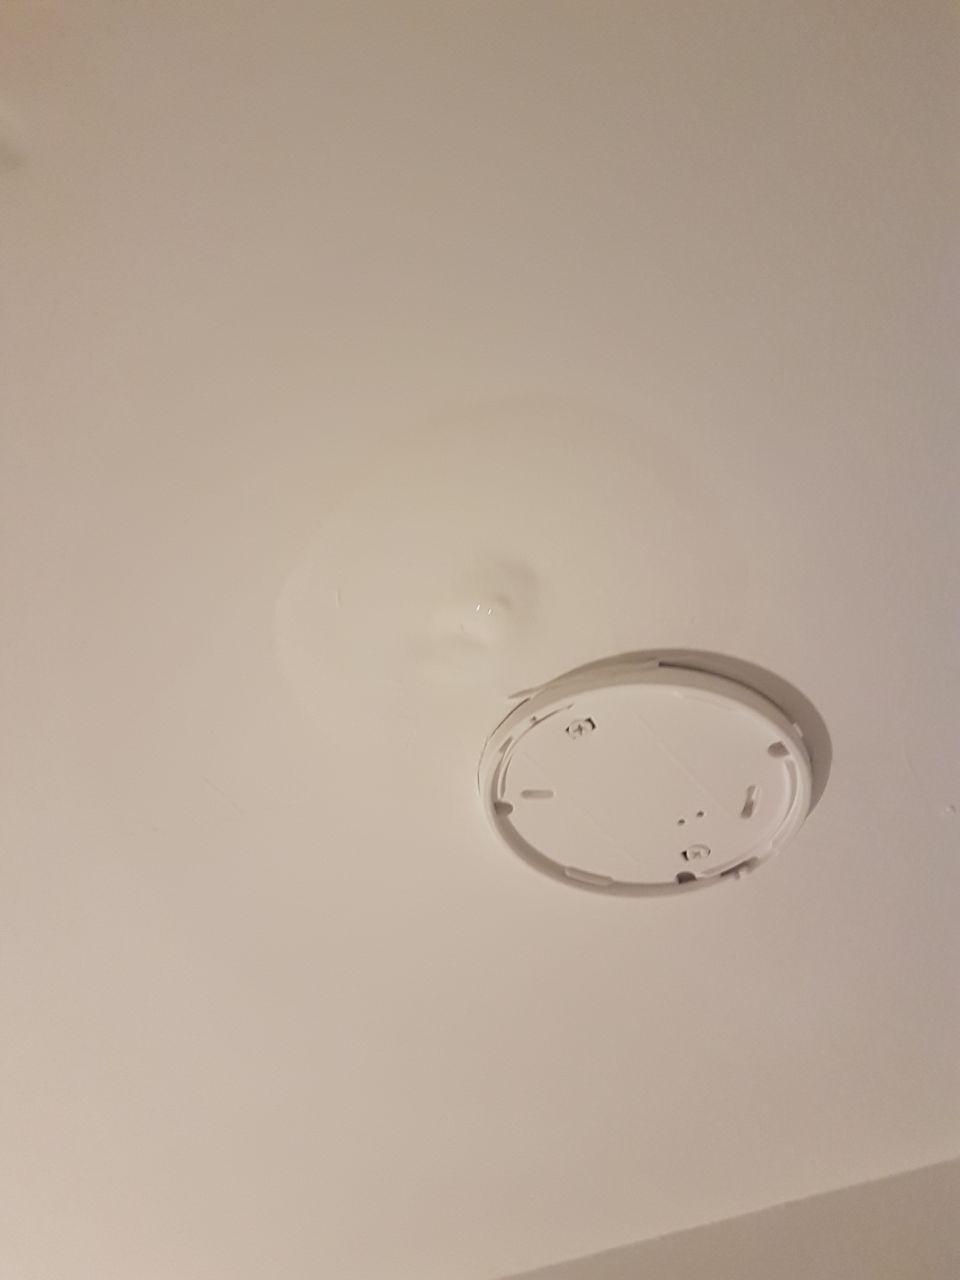 Infiltration d'eau plafond